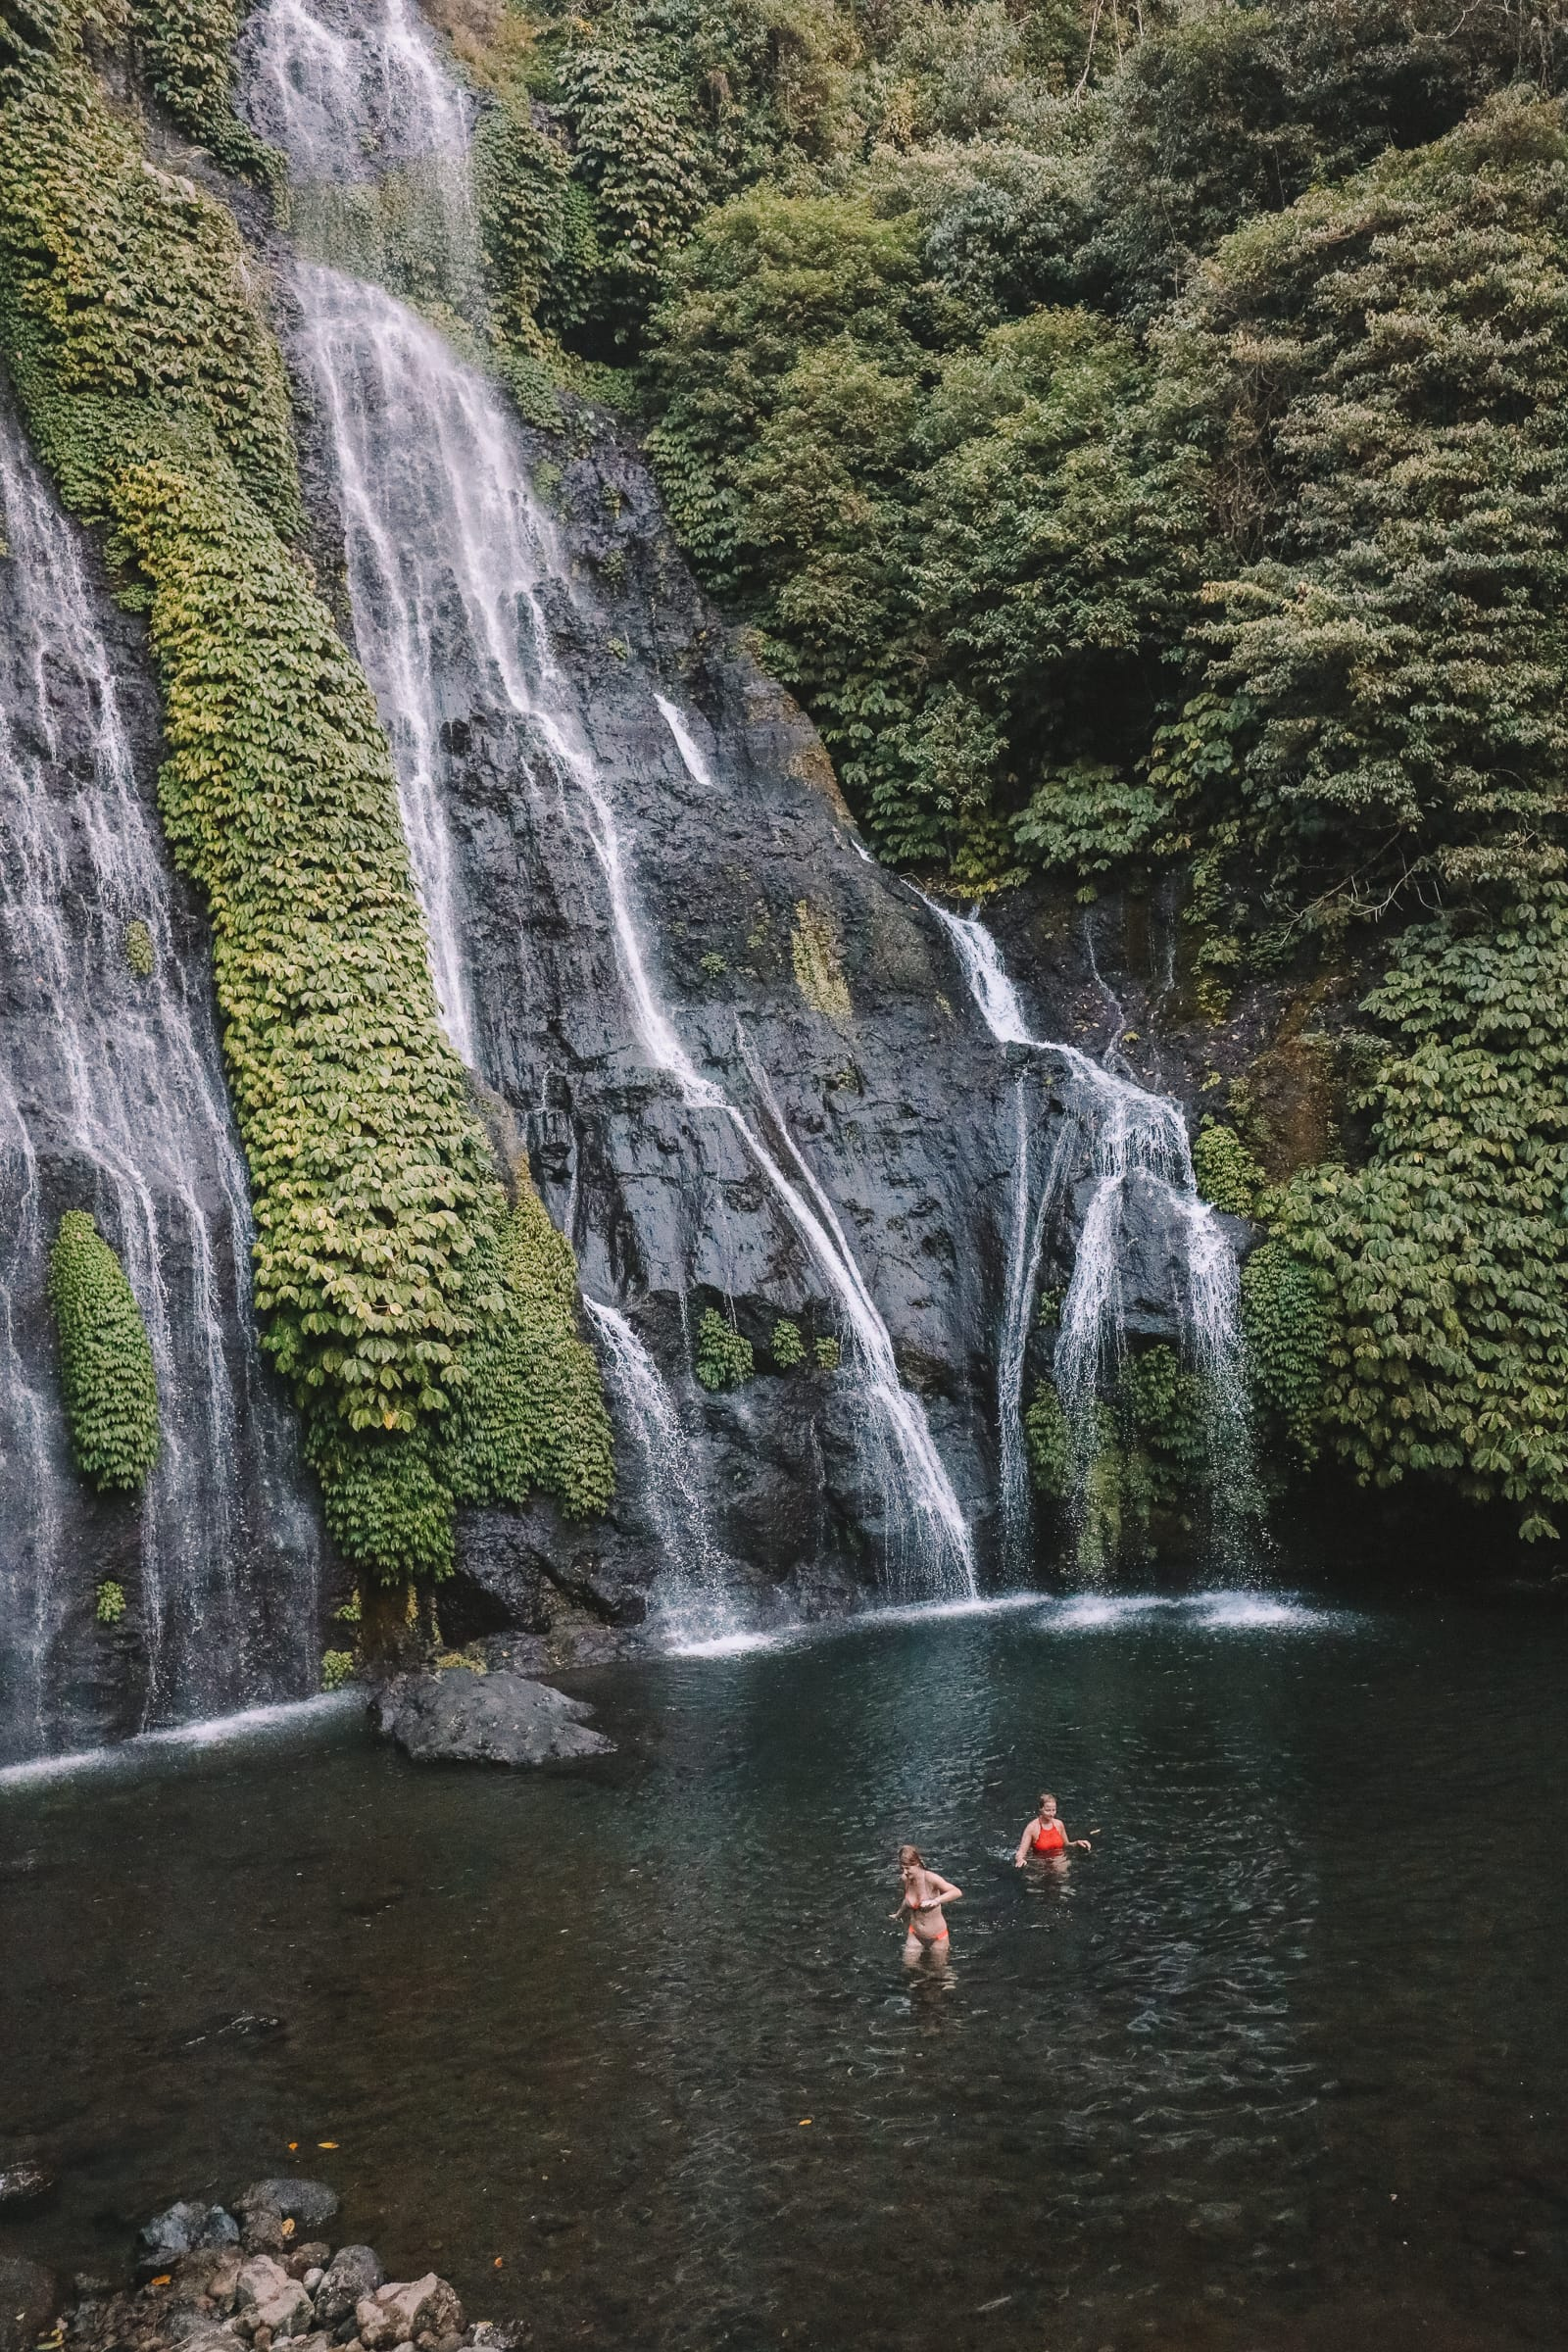 The Amazing Banyumala Twin Waterfalls In The Jungles Of Bali (11)